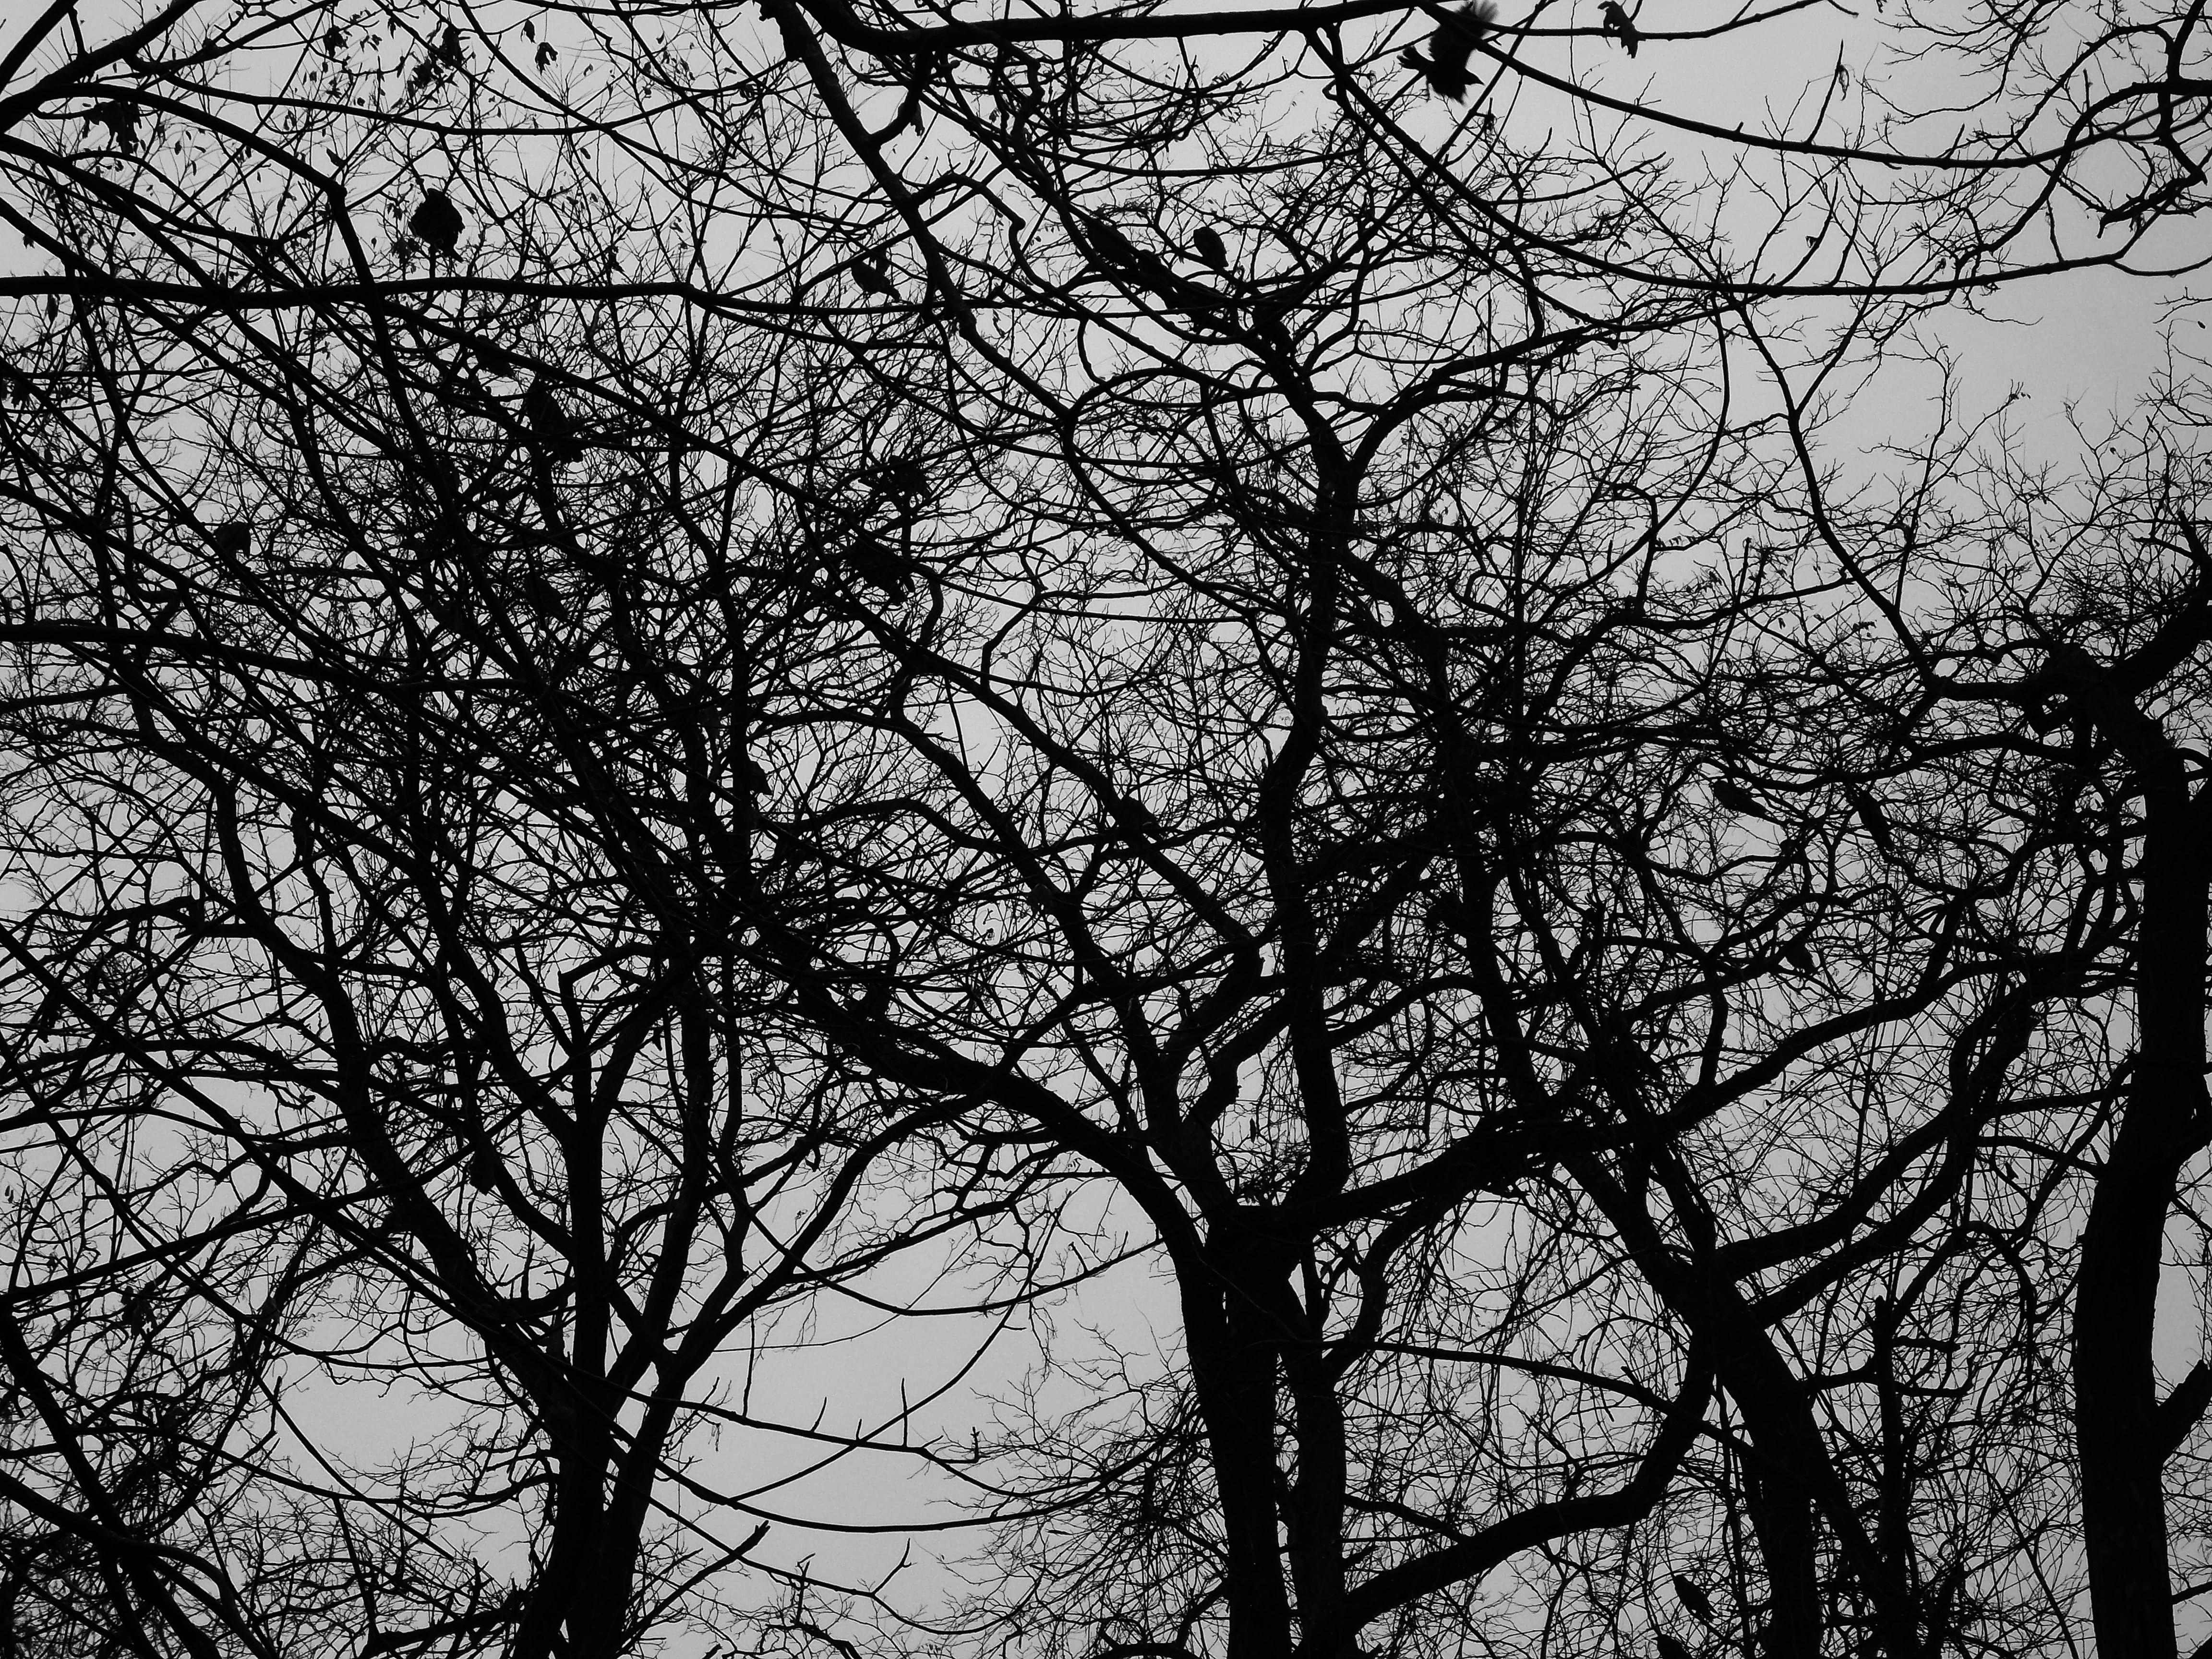 flying black bird in winter